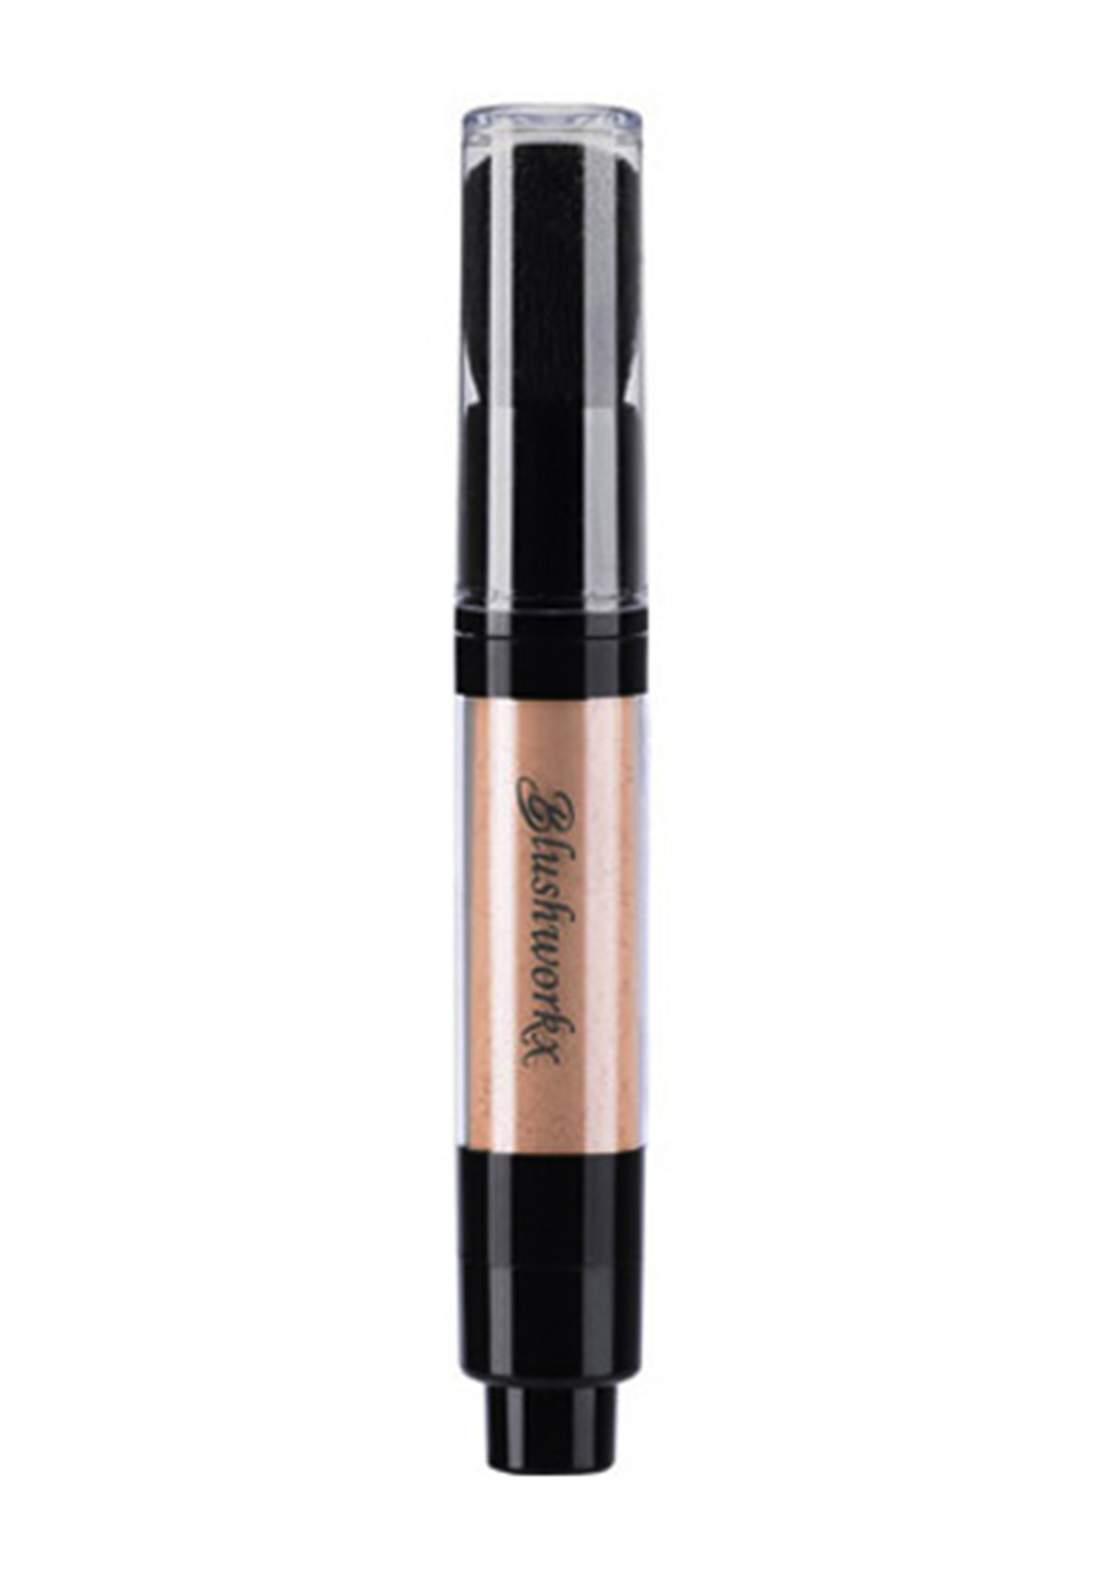 Blushworkx Hollywood Mineral Powder Strokes 3g Beautiful Beige باودر